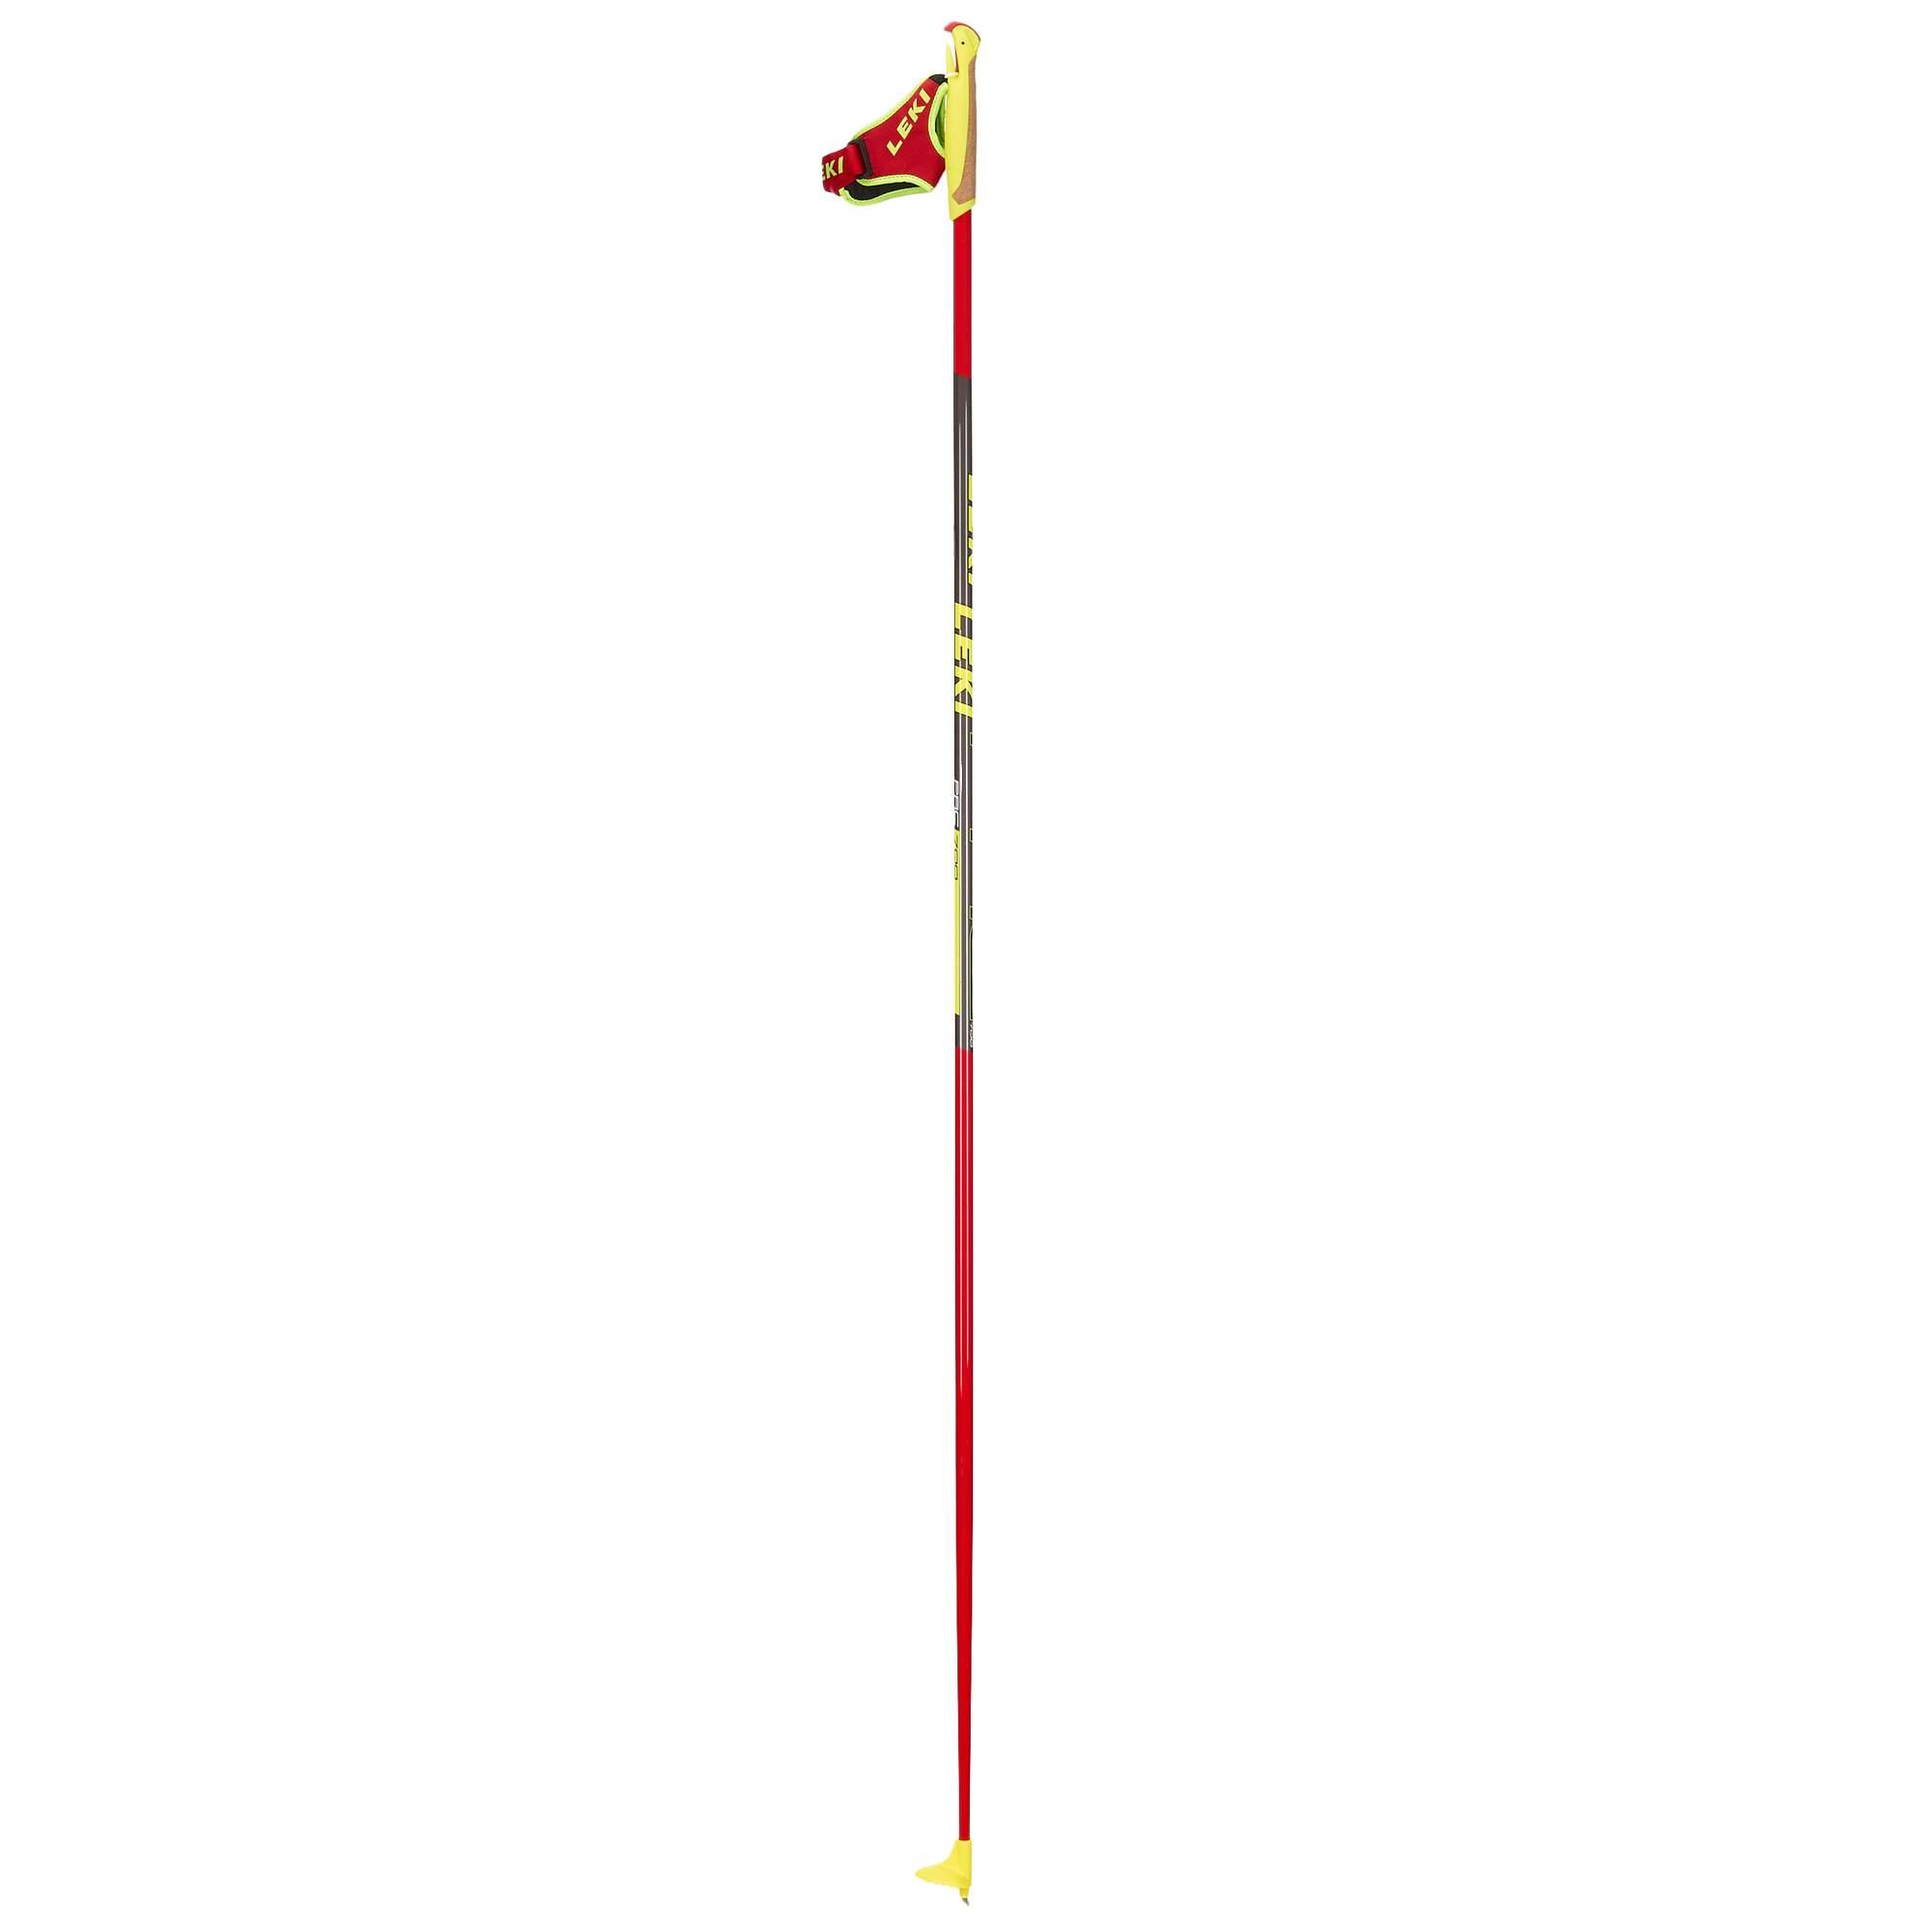 PRC 700 Langlaufstöcke neonrot 140cm